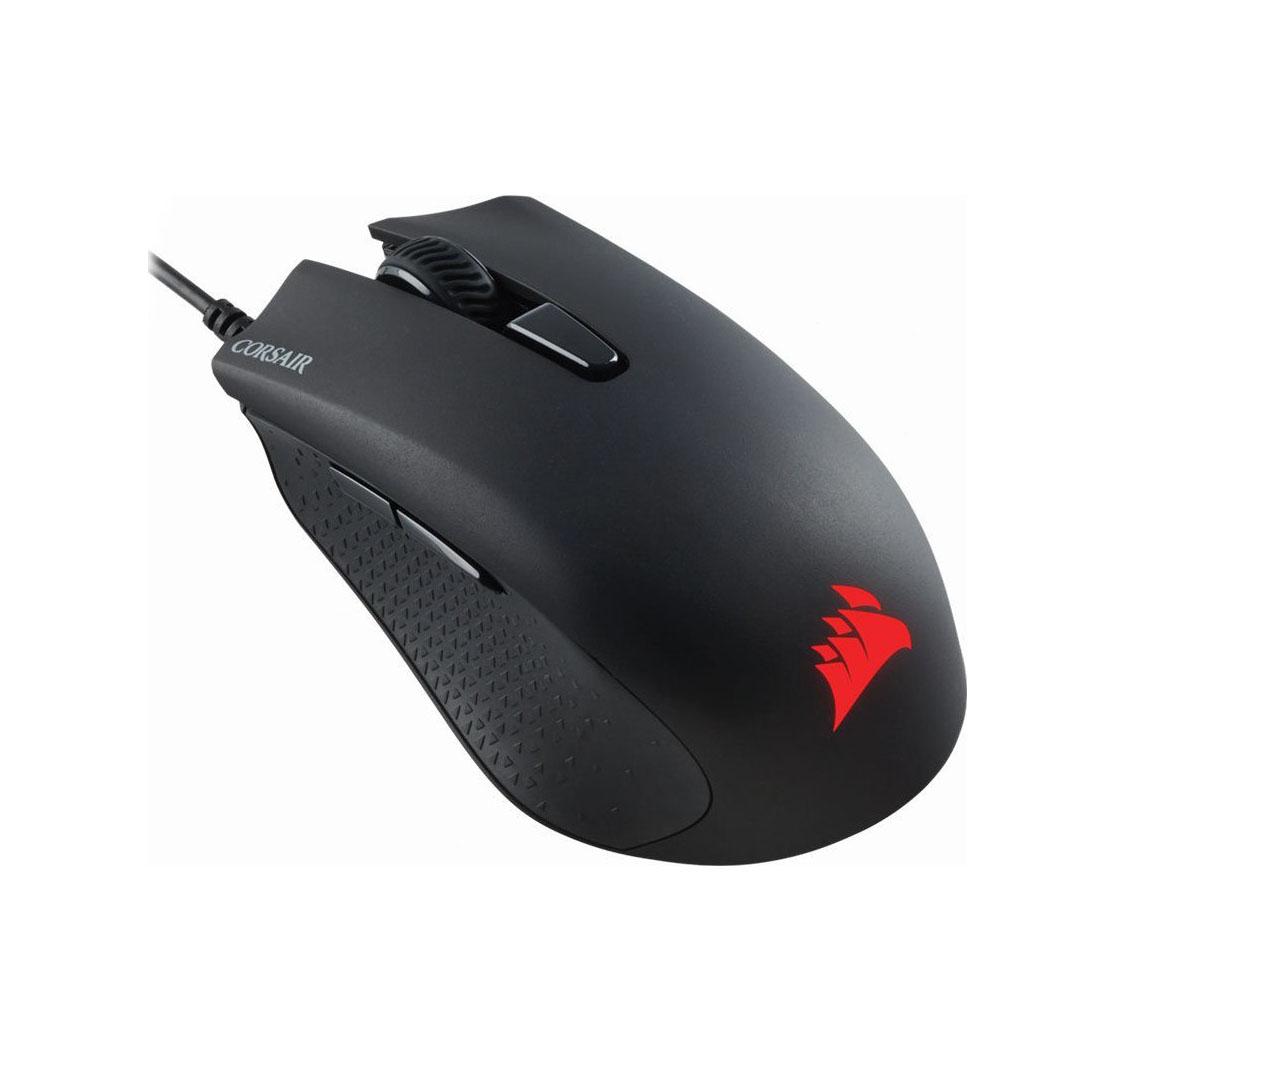 Corsair Harpoon RGB Pro Mouse CH-9301111-EU